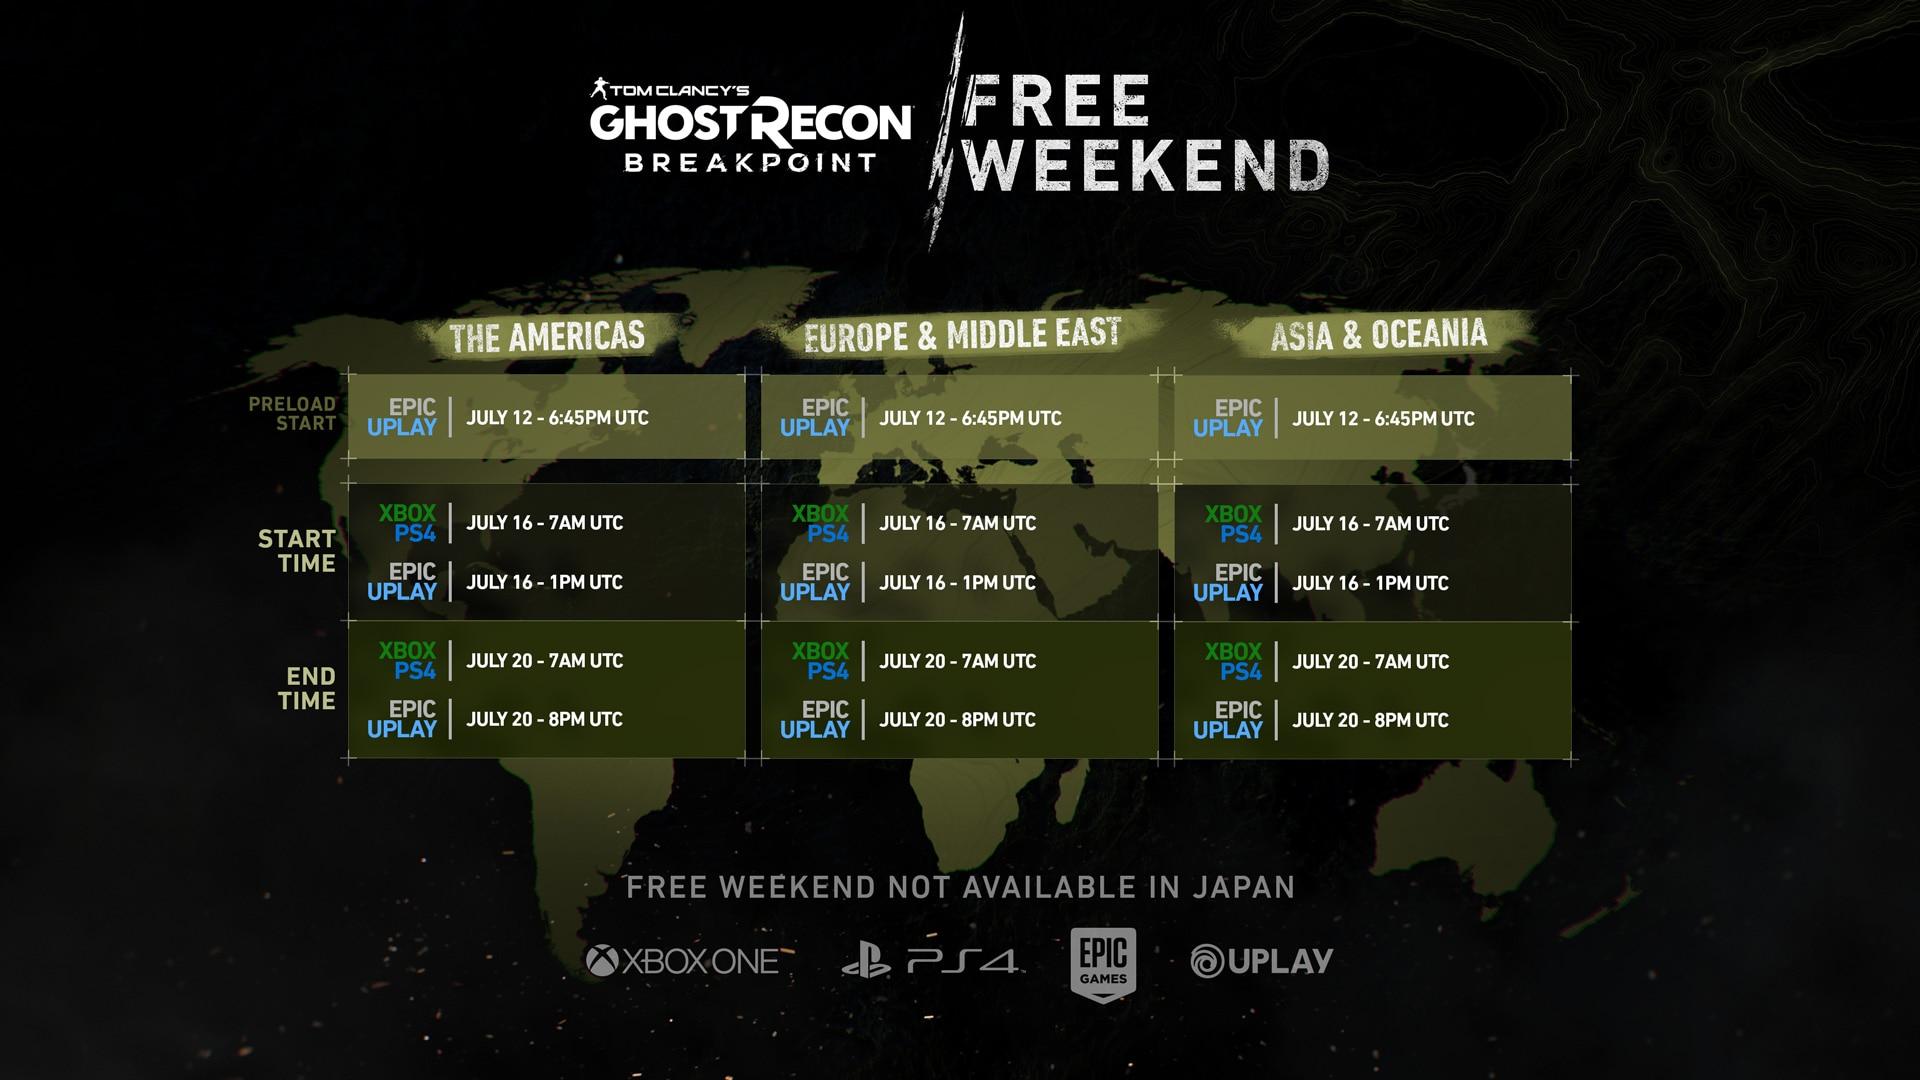 Free Weekend Release Times World Wide